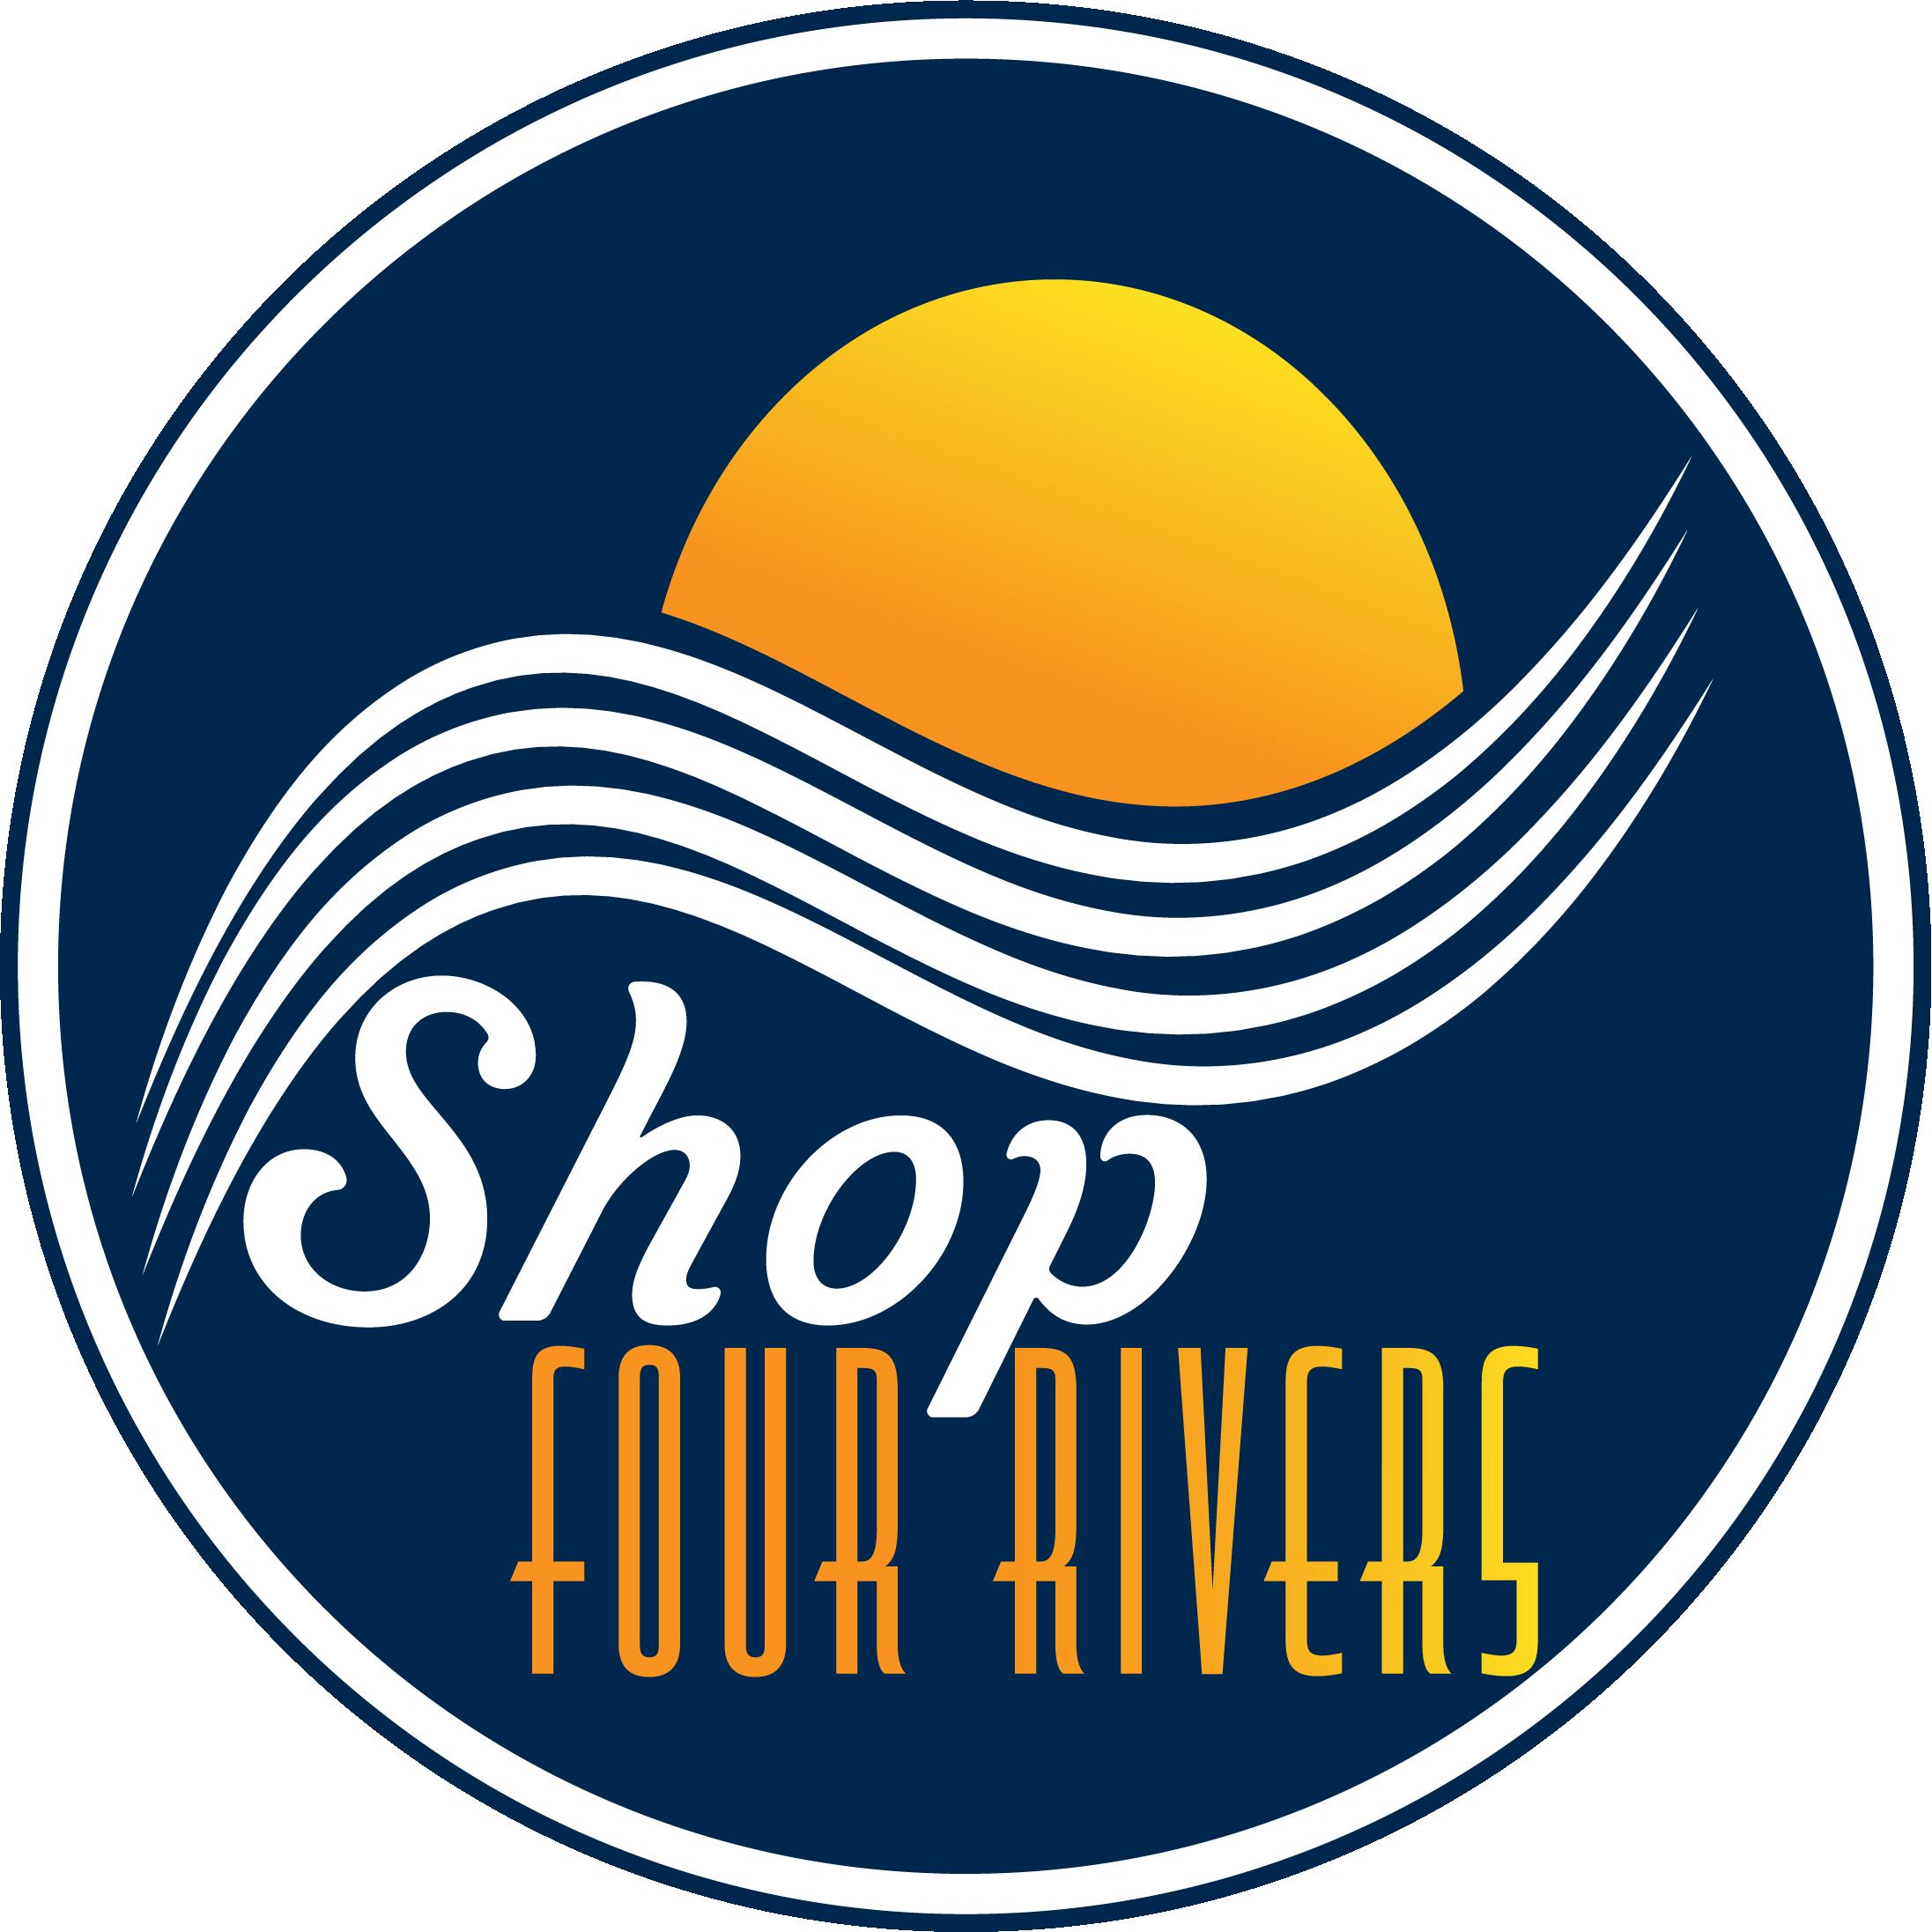 Shop Four Rivers logo